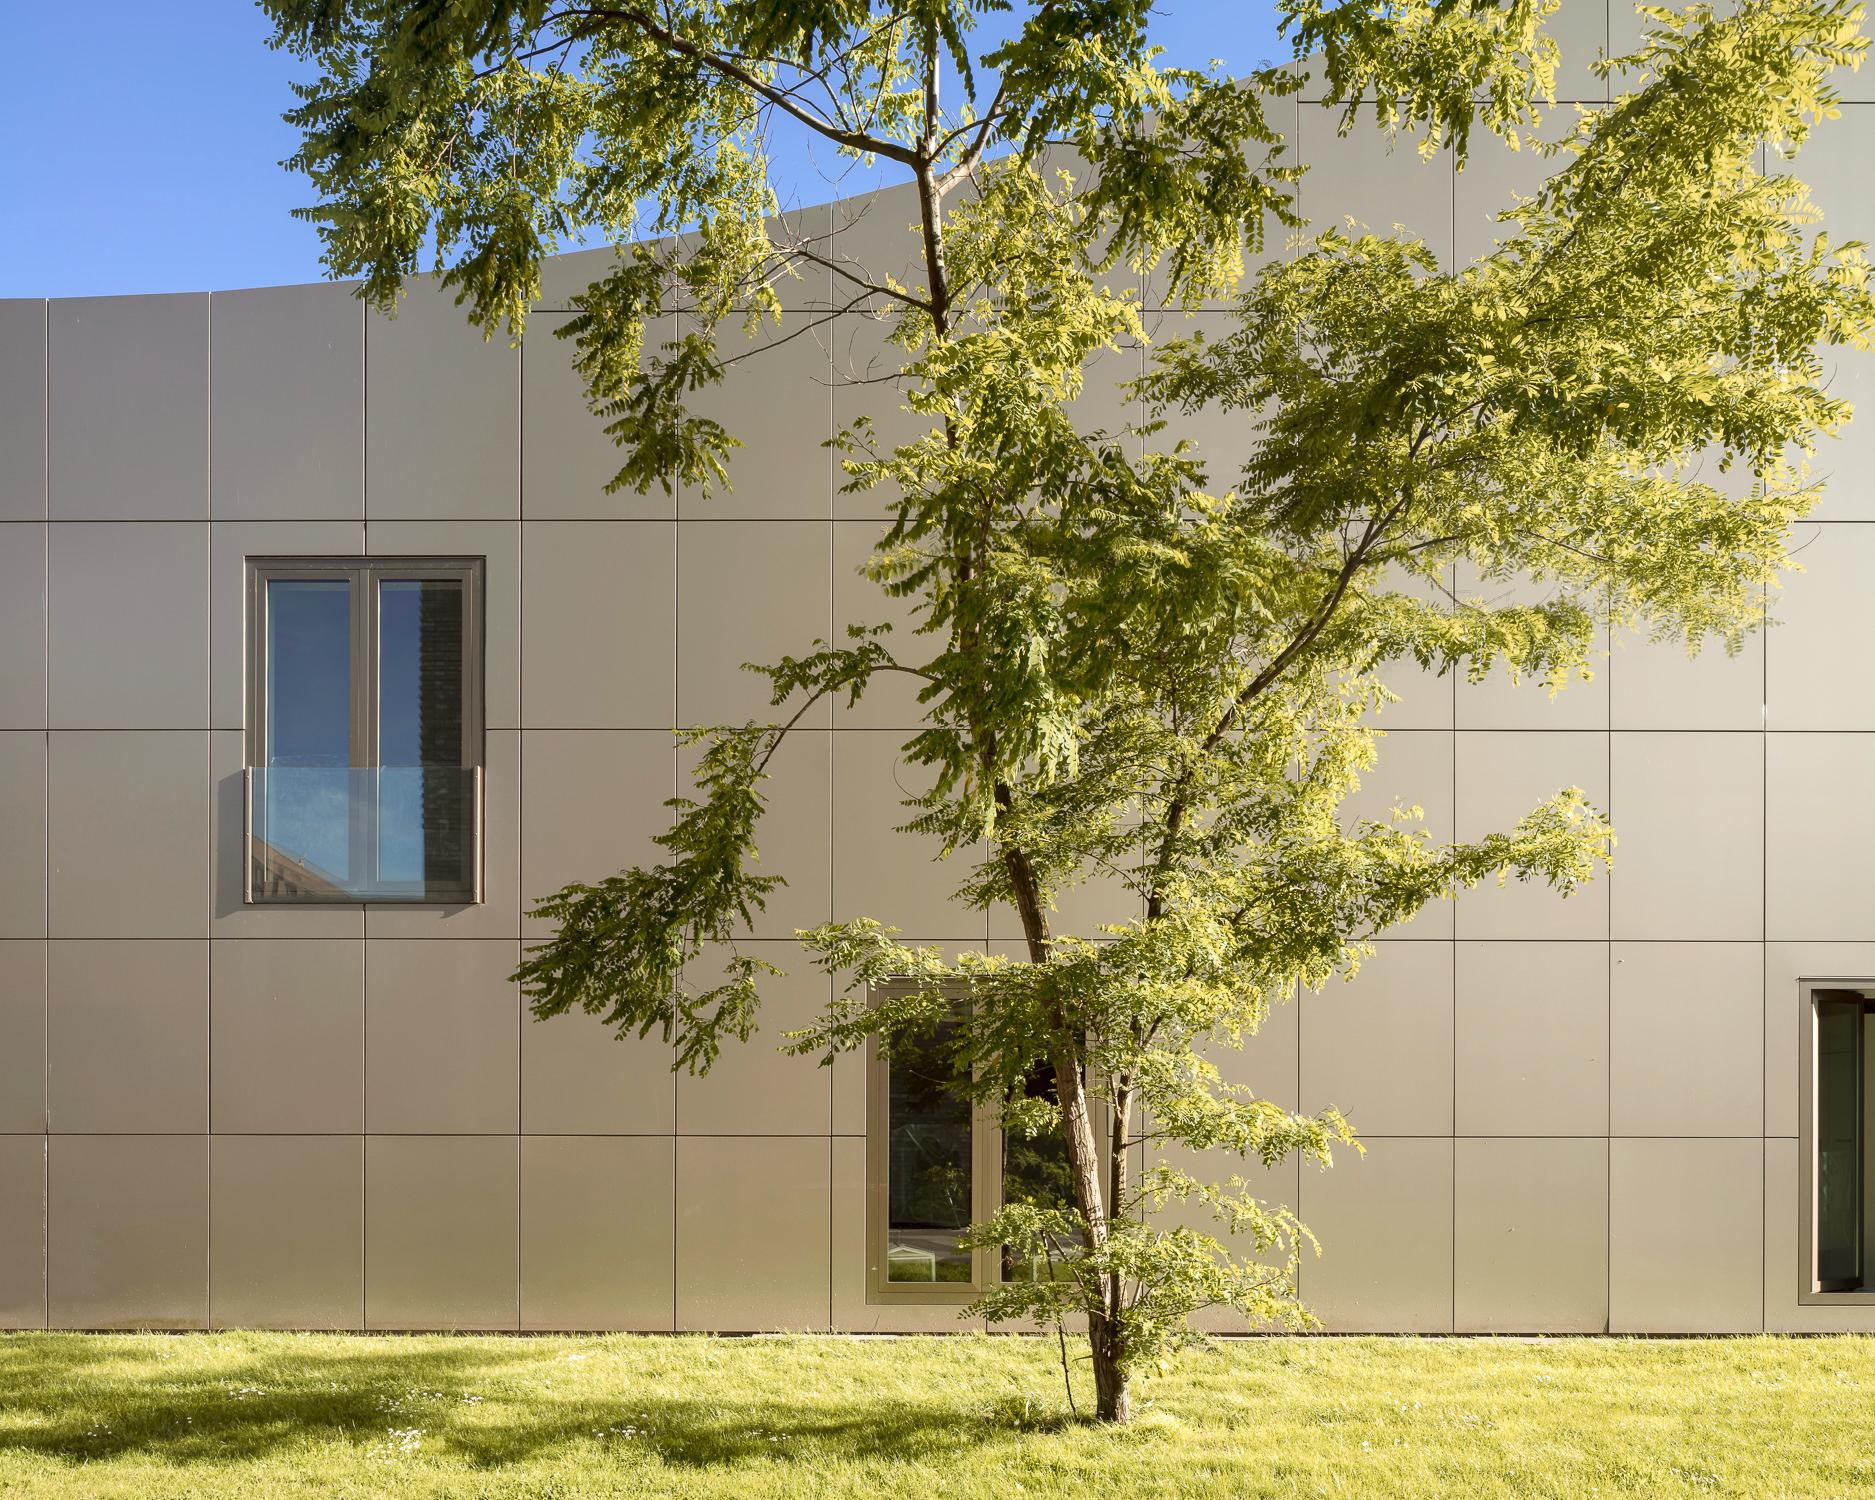 amsterdam-modern-architecture-facade-het-funen-mark-hadden-photography-architectuurfotograaf-117-2.jpg